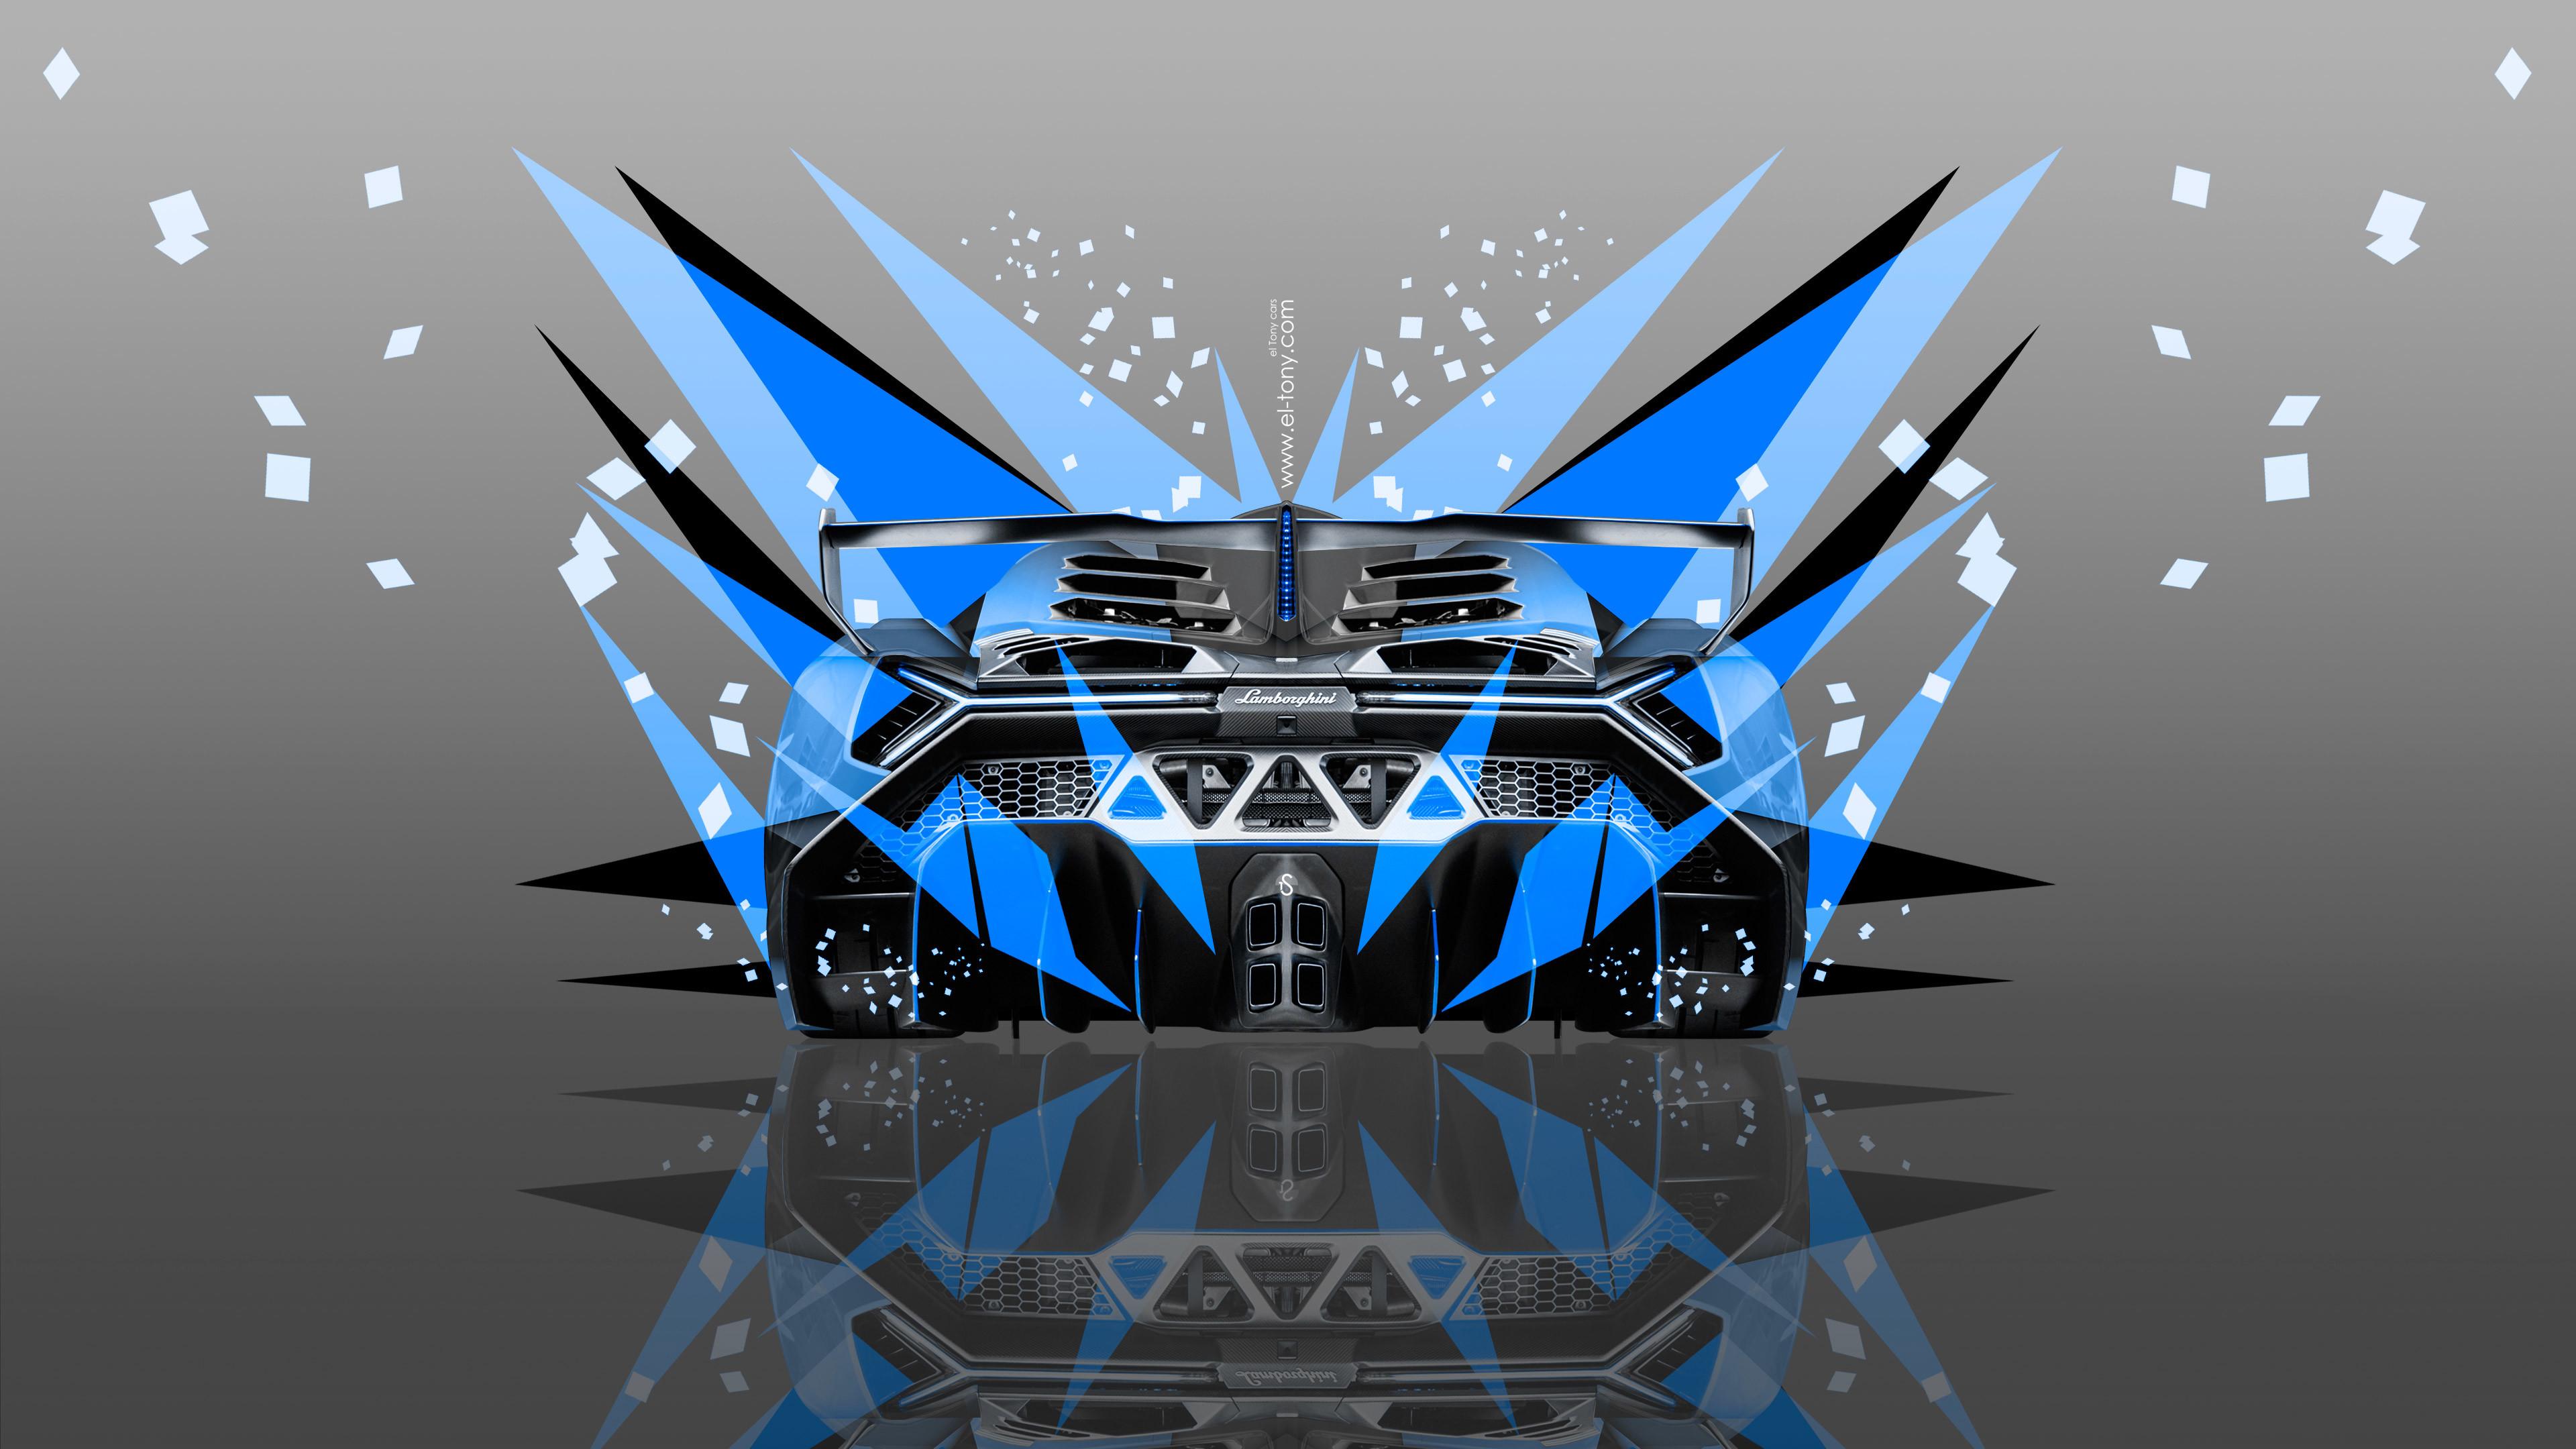 Lamborghini-Veneno-Back-Abstract-Transformer-Car-2014-Blue-